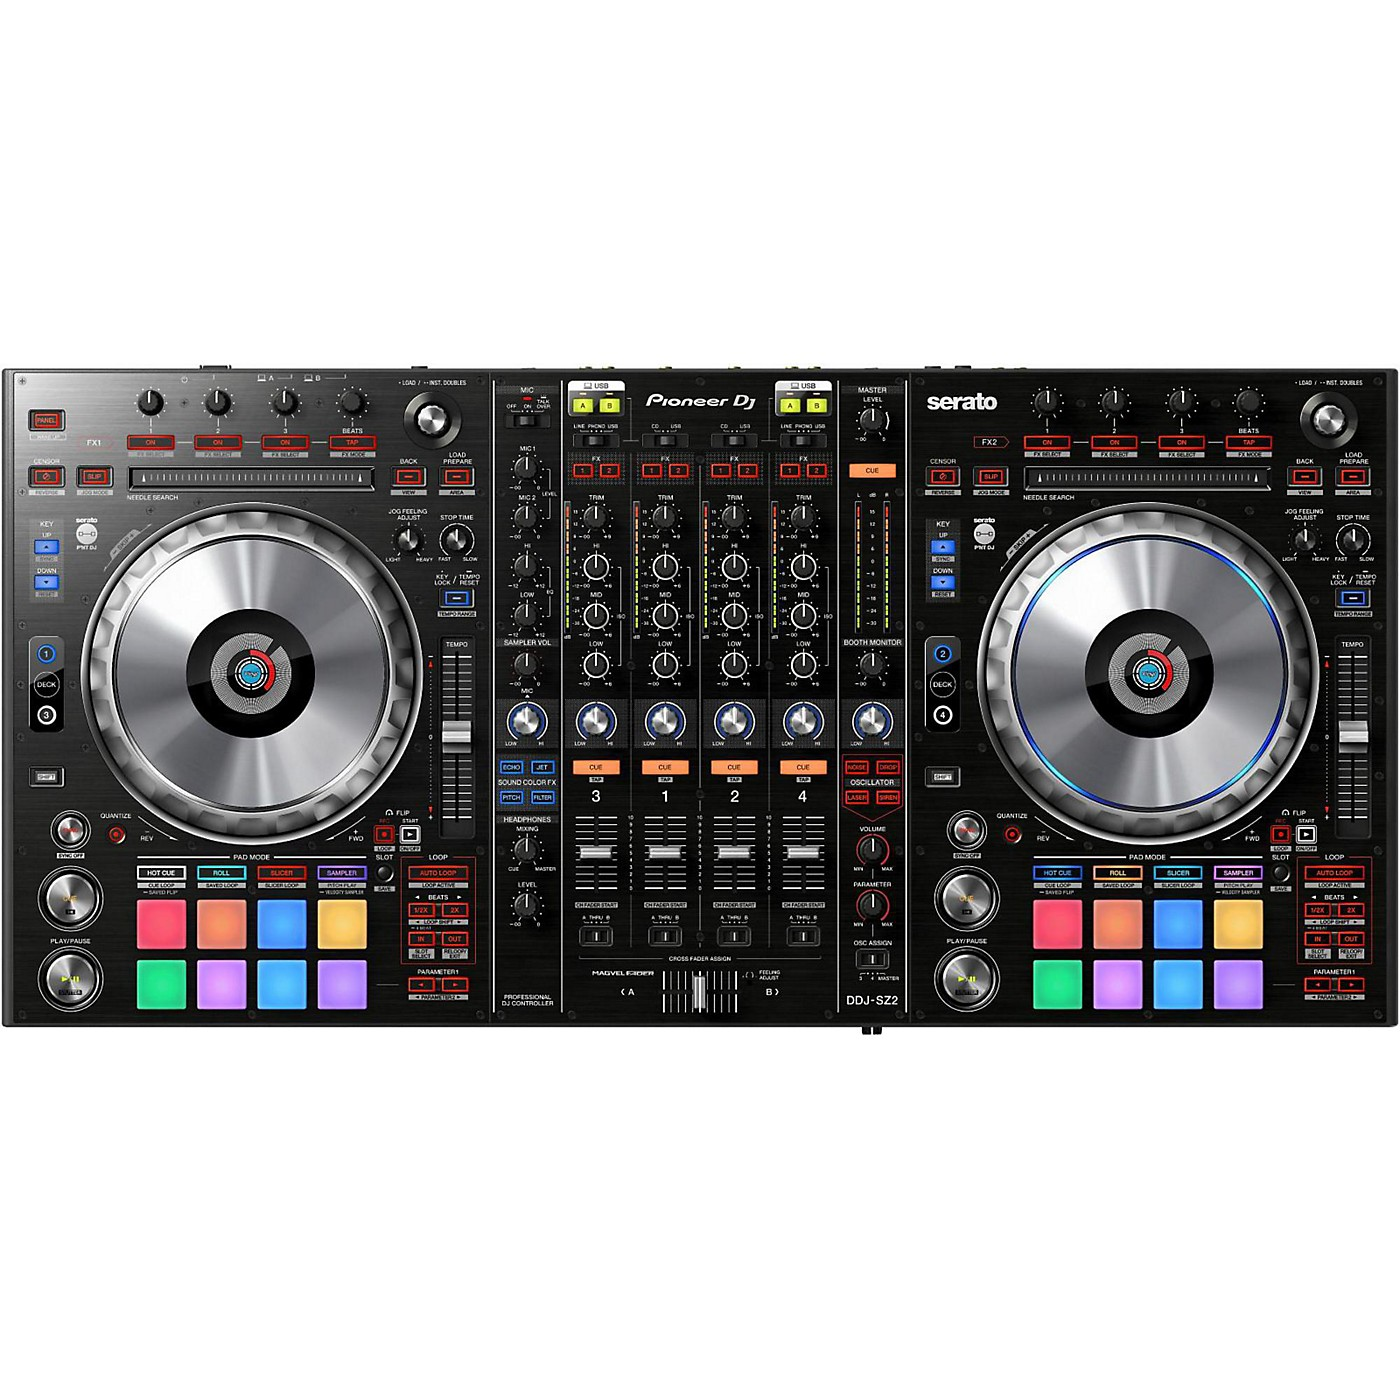 Pioneer DDJ-SZ2 Professional DJ Controller with Serato DJ thumbnail